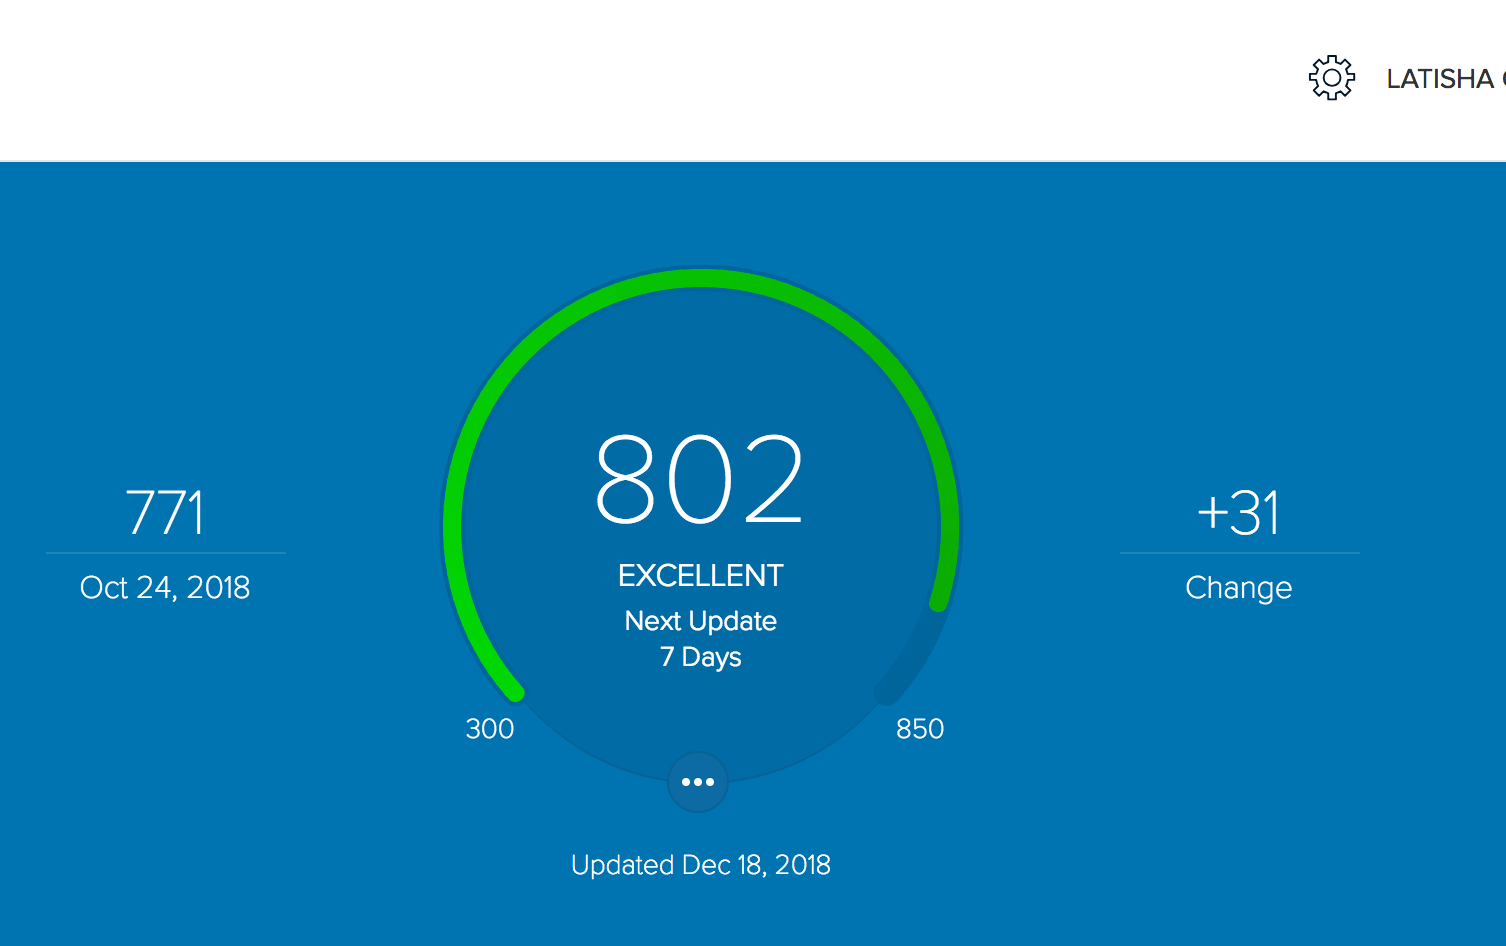 800 credit score